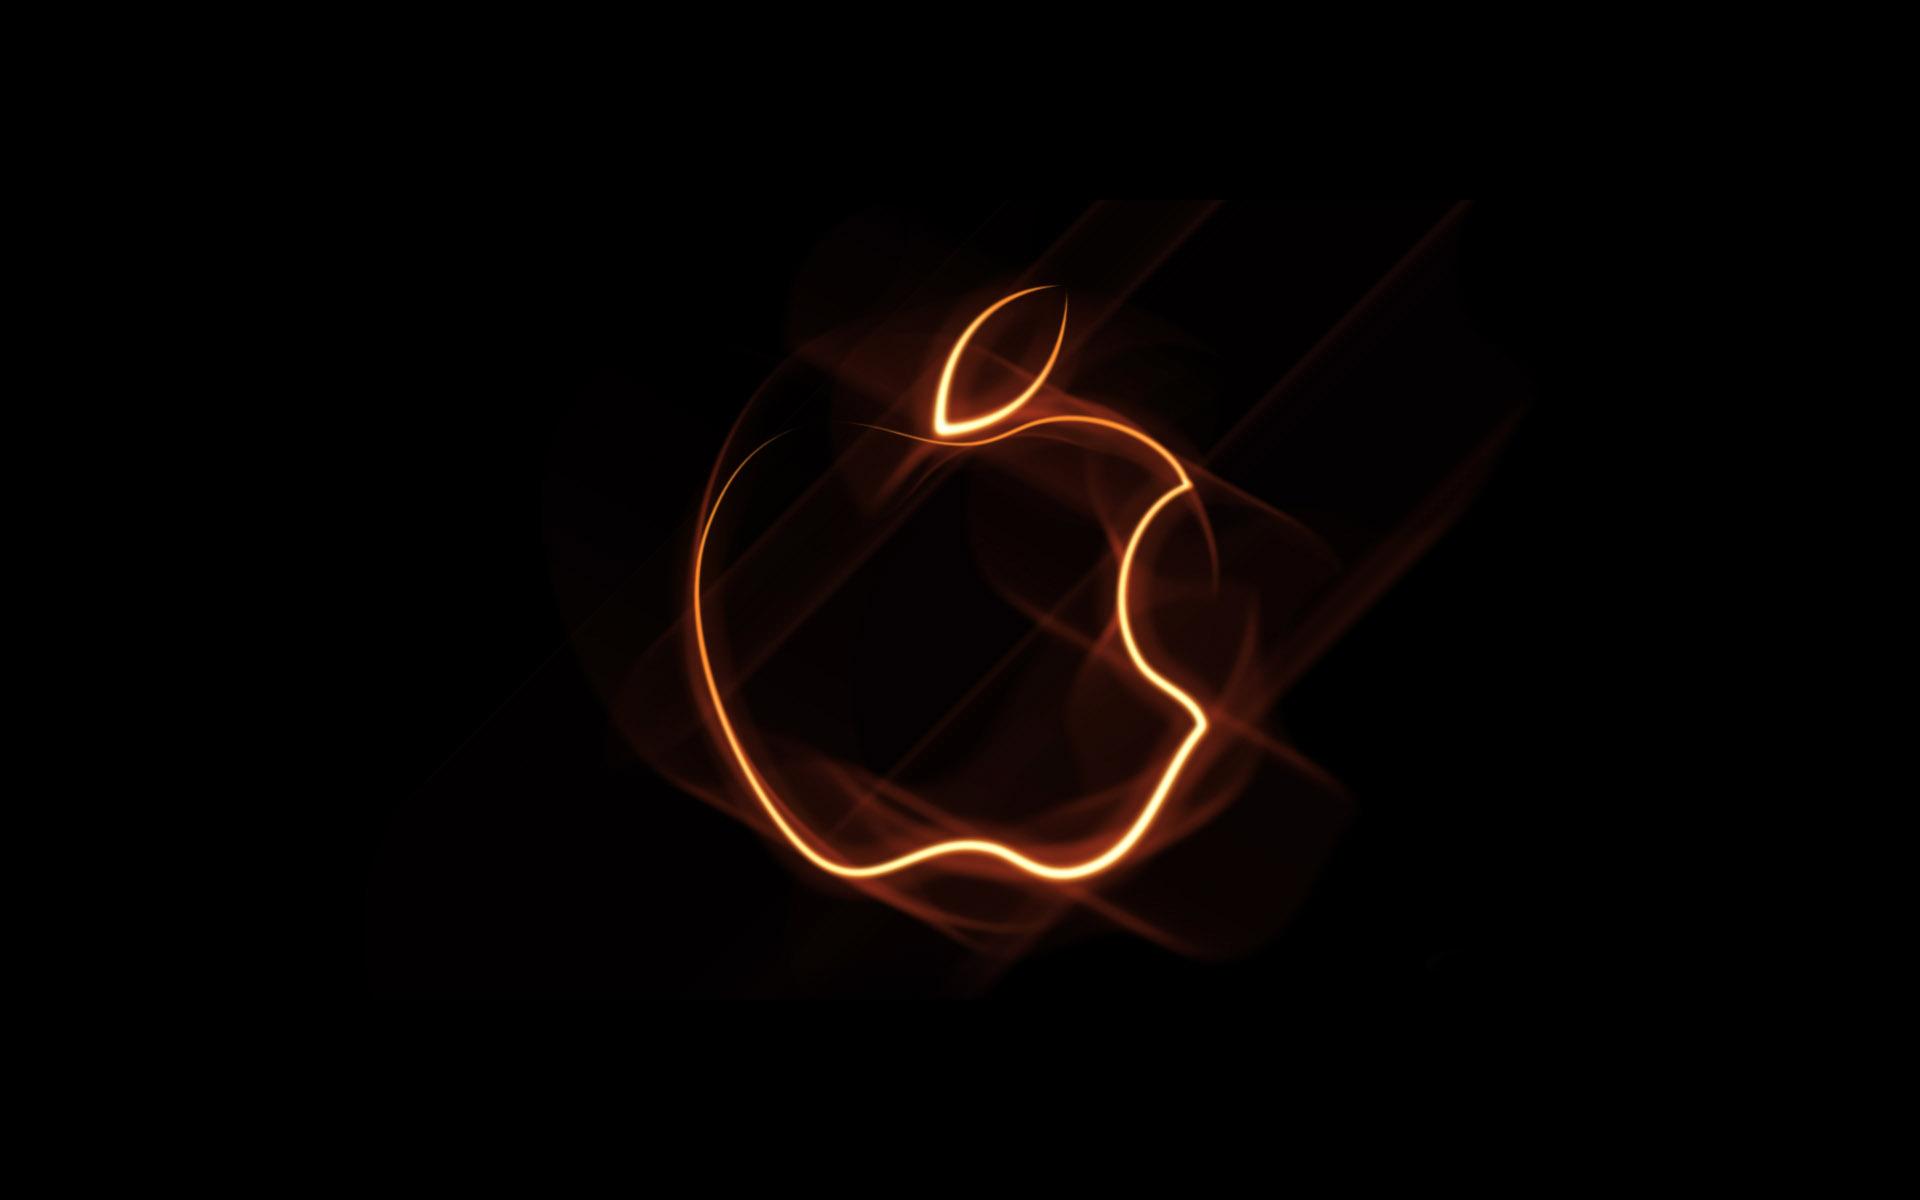 Apple Macbook Background Background Admin Apple